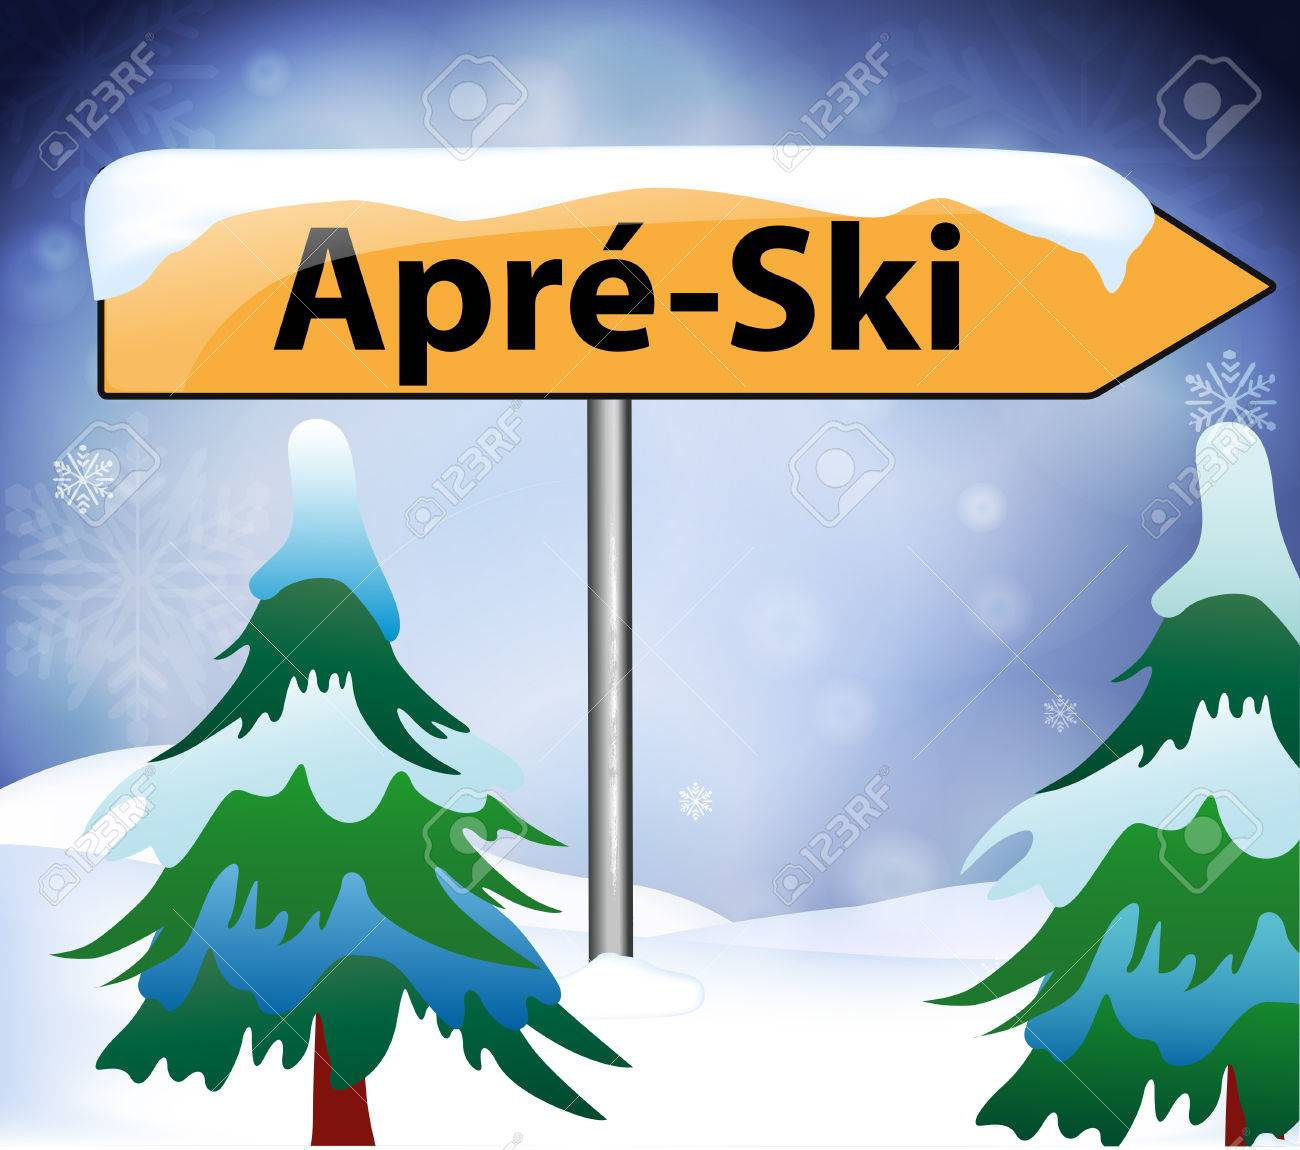 Apres ski as a signpost - 48862113